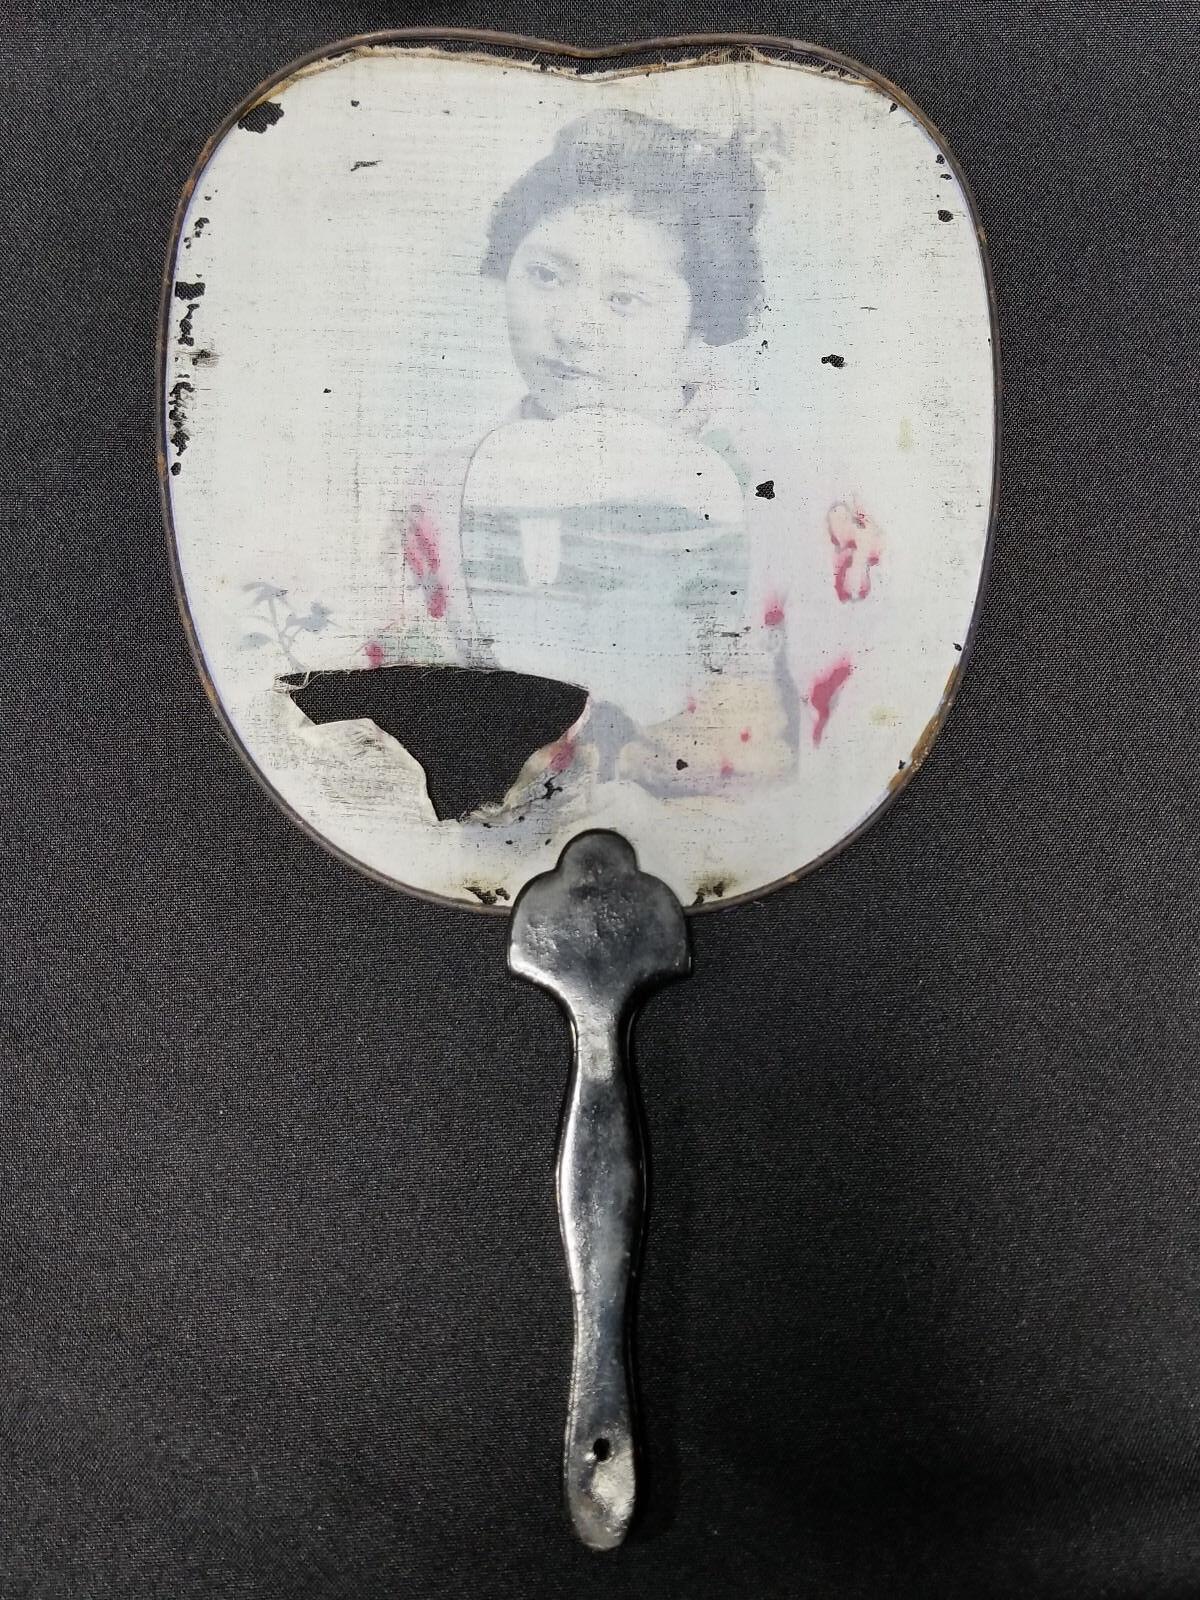 ANTIQUE JAPANESE LADYS HAND HELD FAN SEATTLE 1909